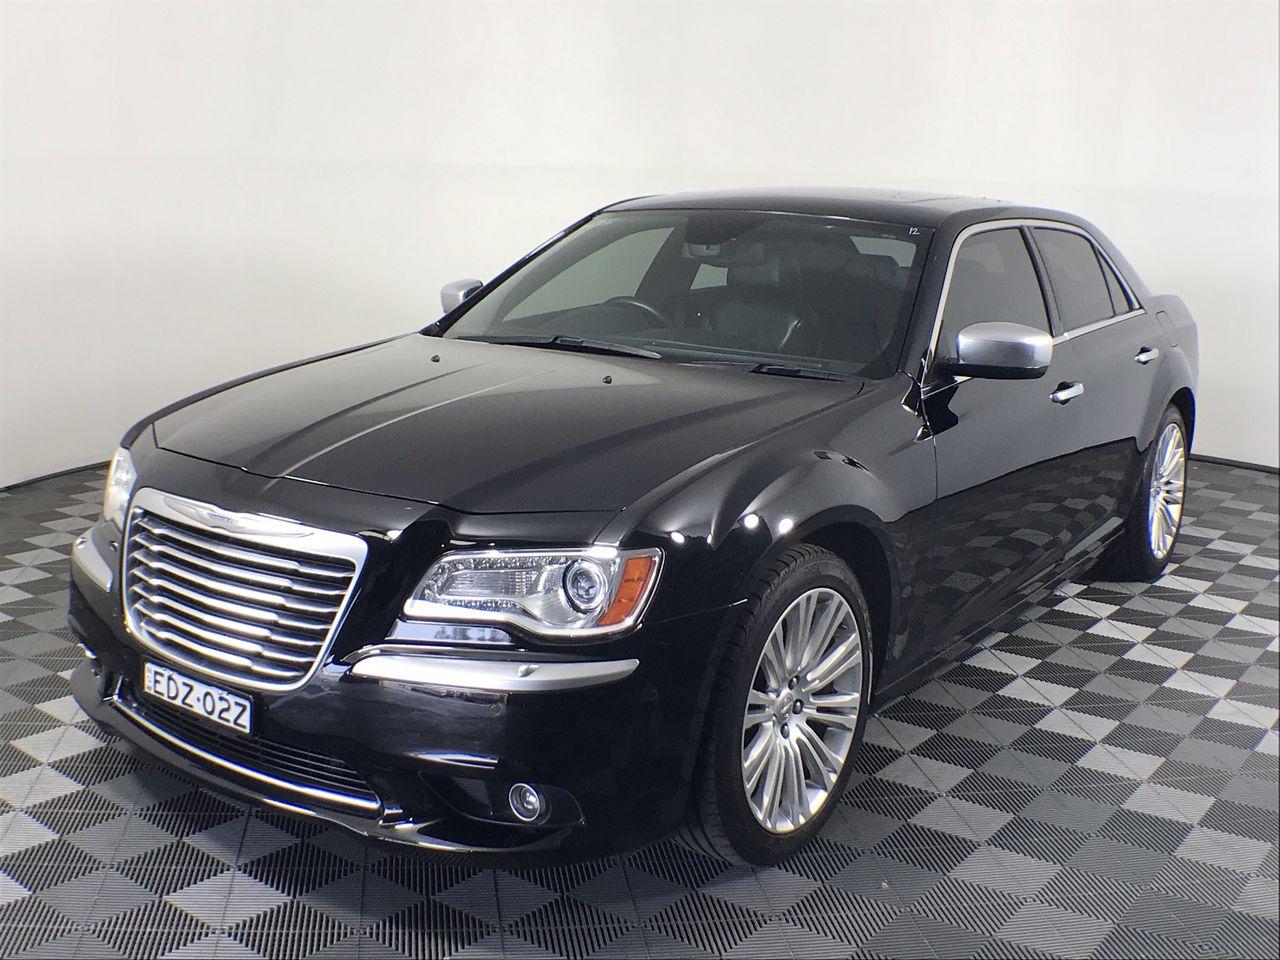 2014 Chrysler 300 C LUXURY LX Automatic - 8 Speed Sedan